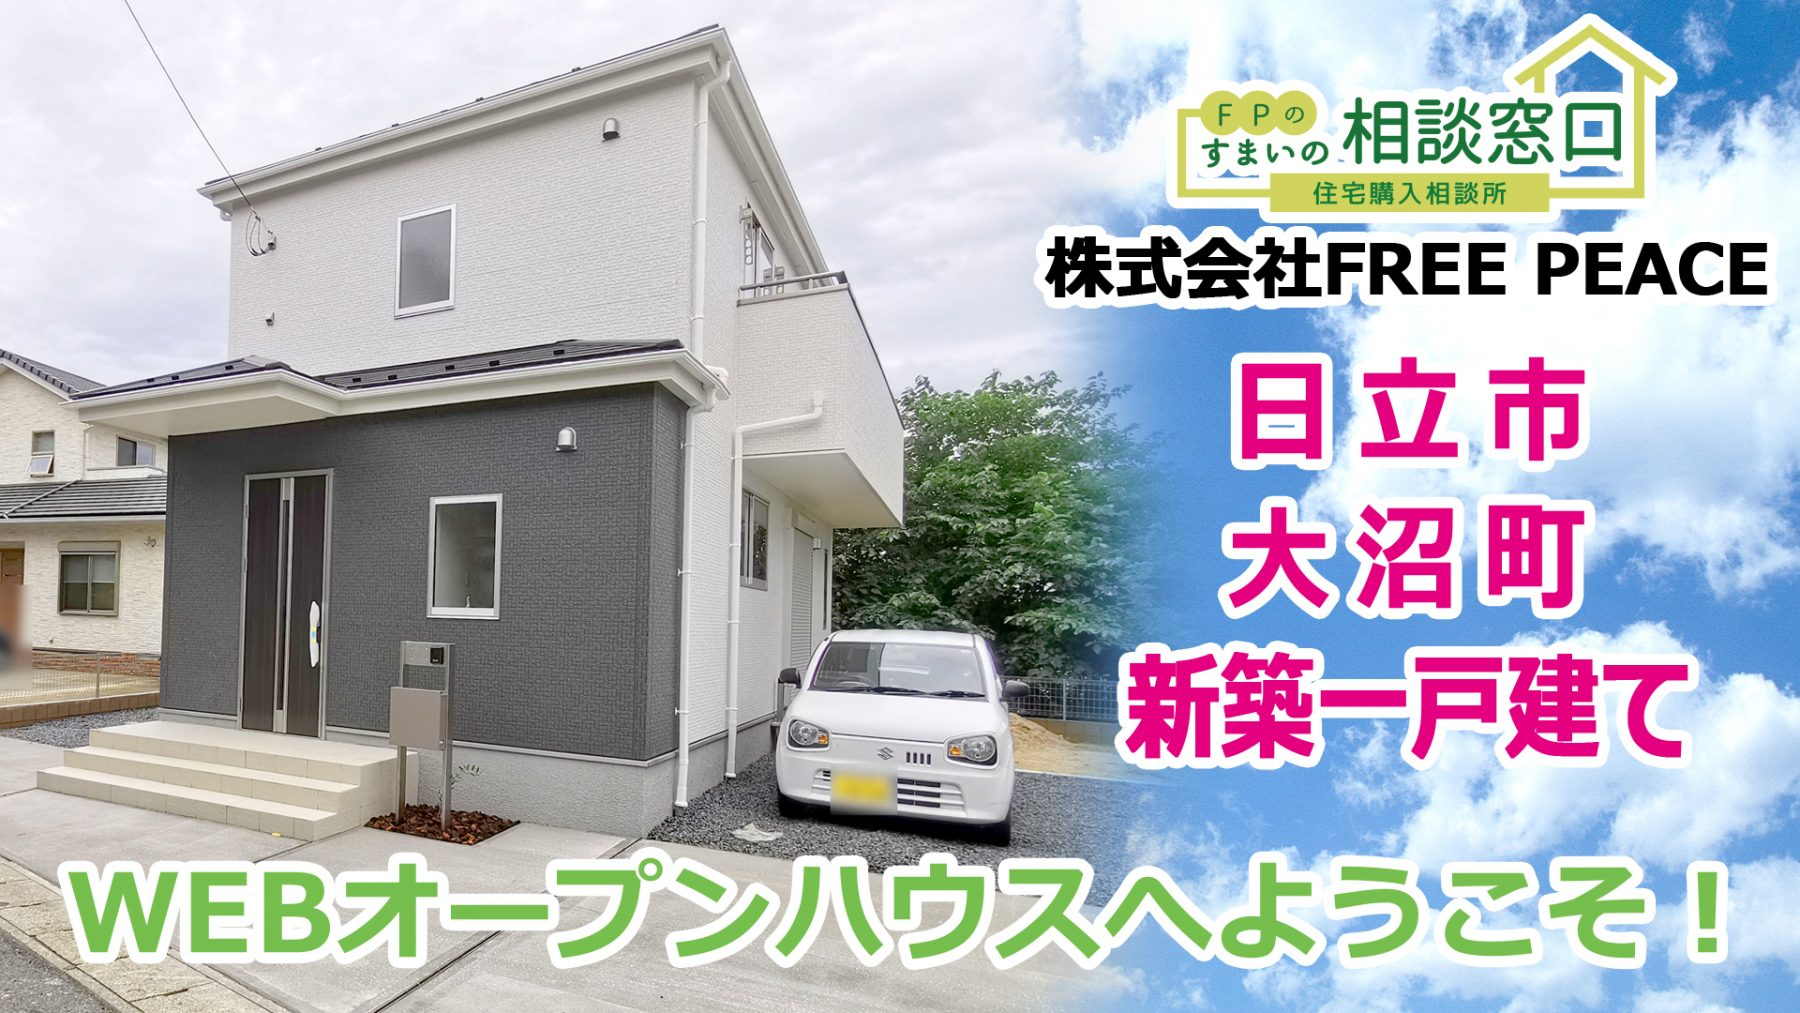 WEBオープンハウス♪日立市大沼町新築一戸建てです。